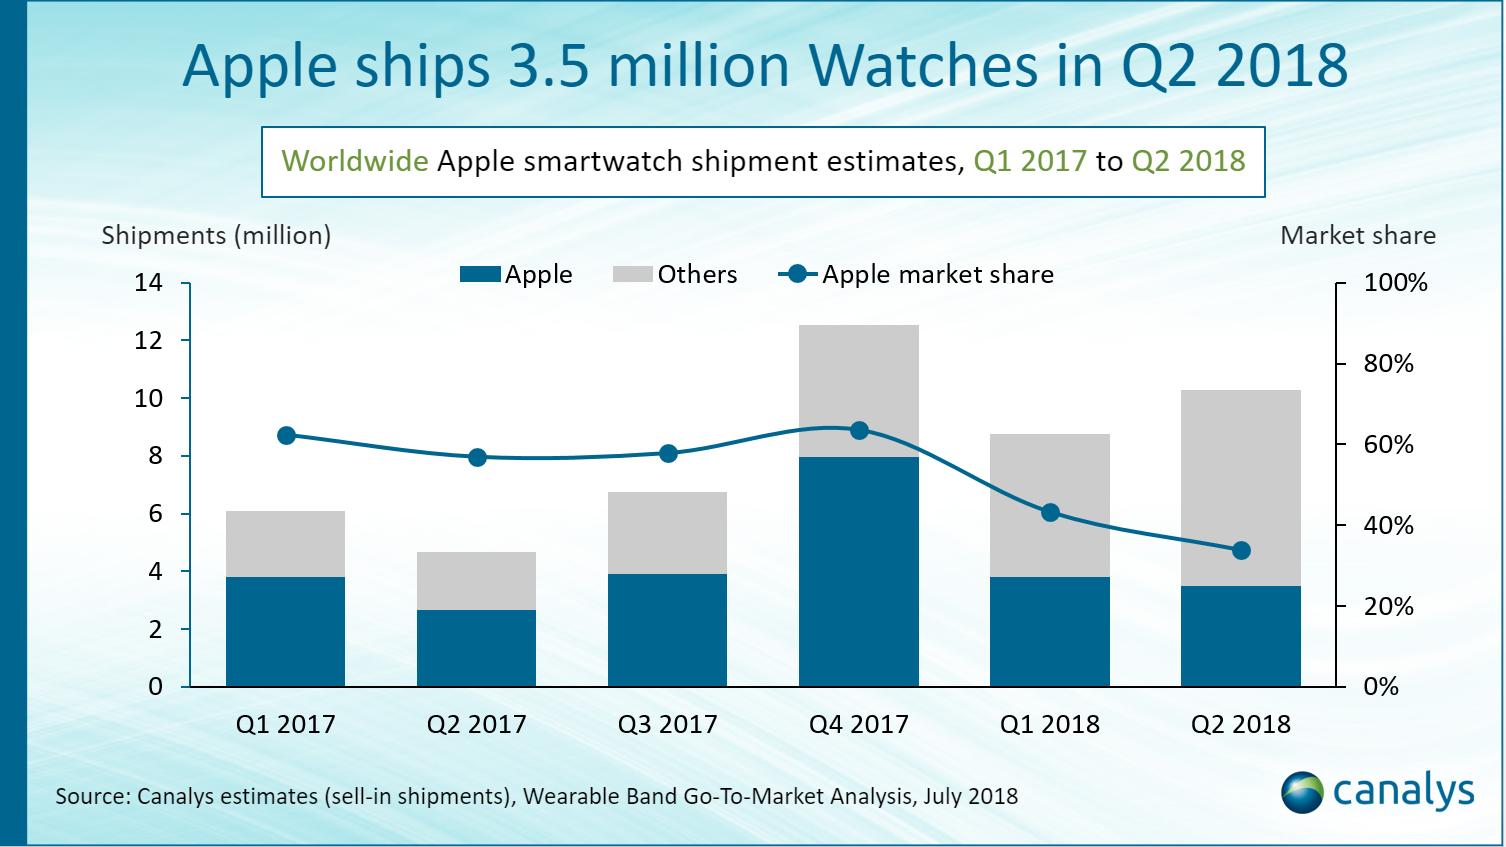 Worldwide Apple smartwatch shipment estimates, Q1 2017 to Q2 2018